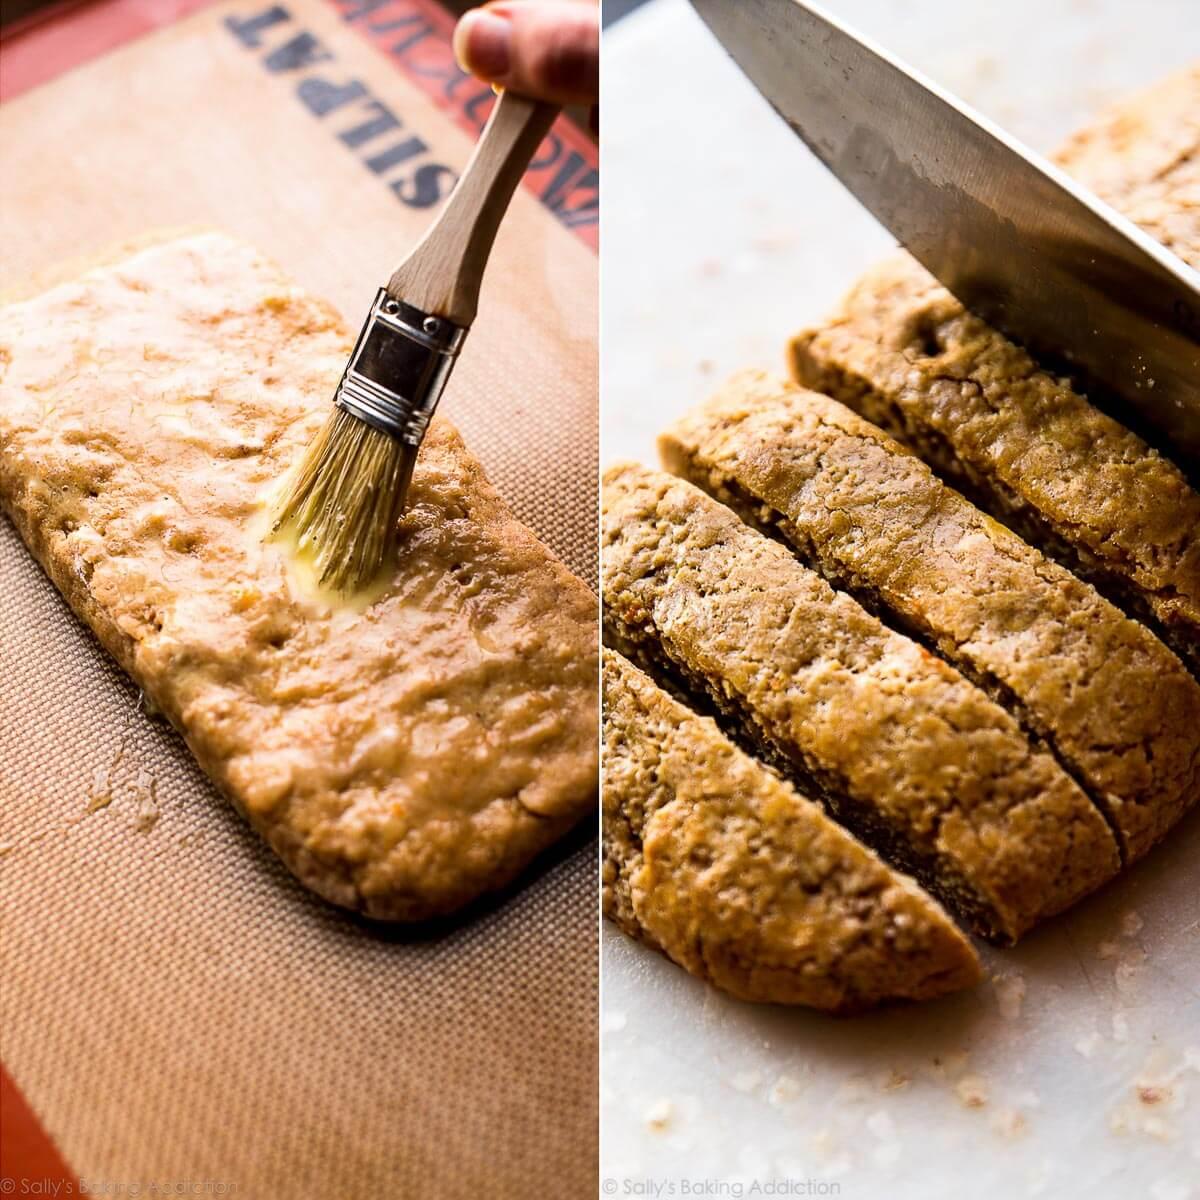 How to make dark chocolate orange biscotti on sallysbakingaddiction.com